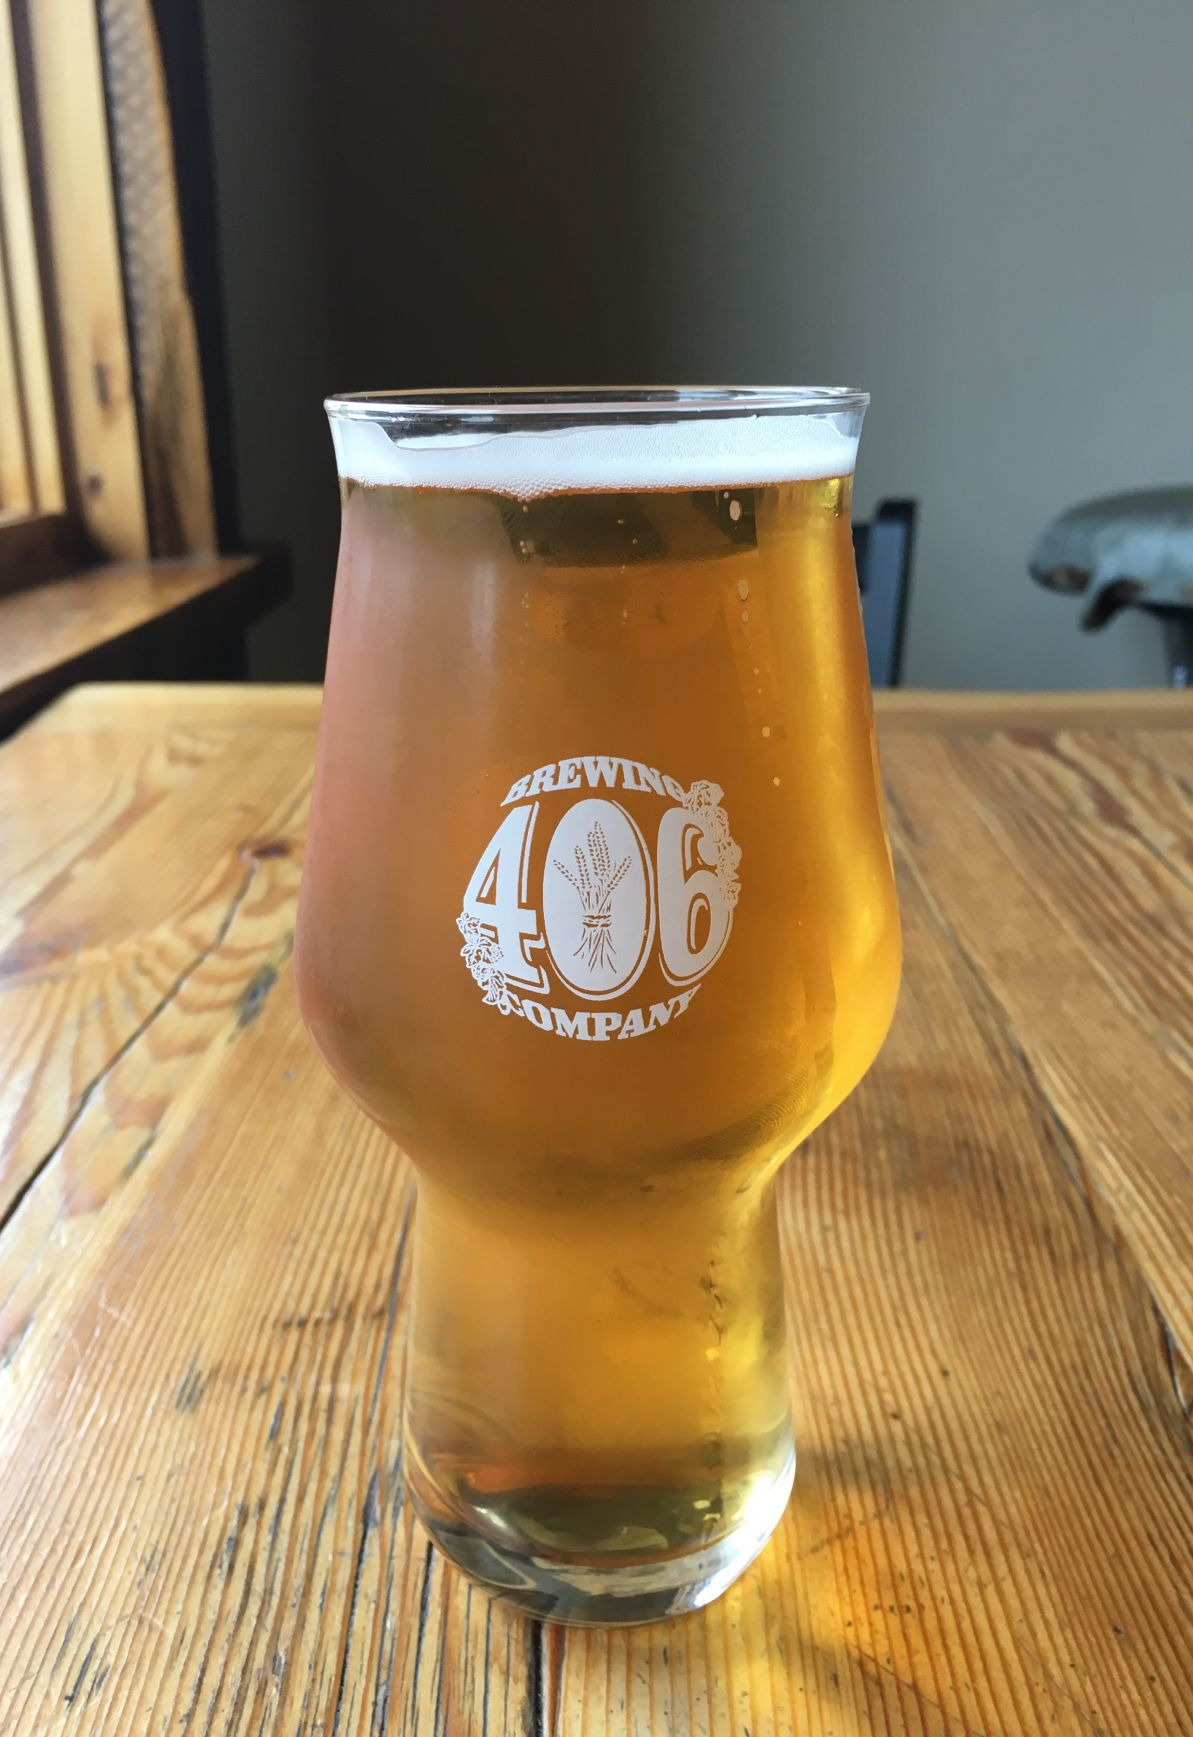 406 Brewing Beer